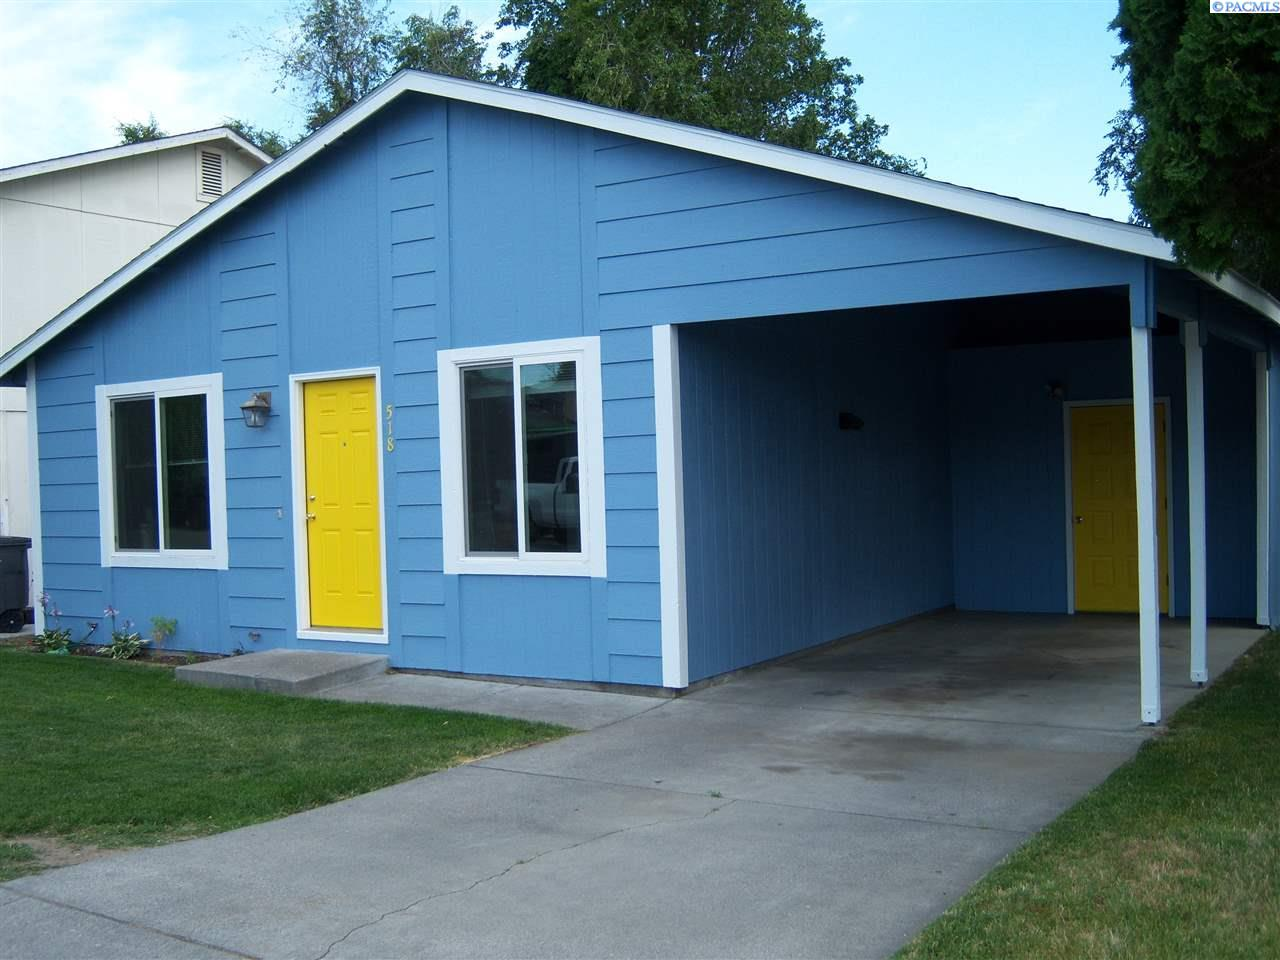 Single Family Homes for Sale at 518 E 8th Avenue Kennewick, Washington 99336 United States